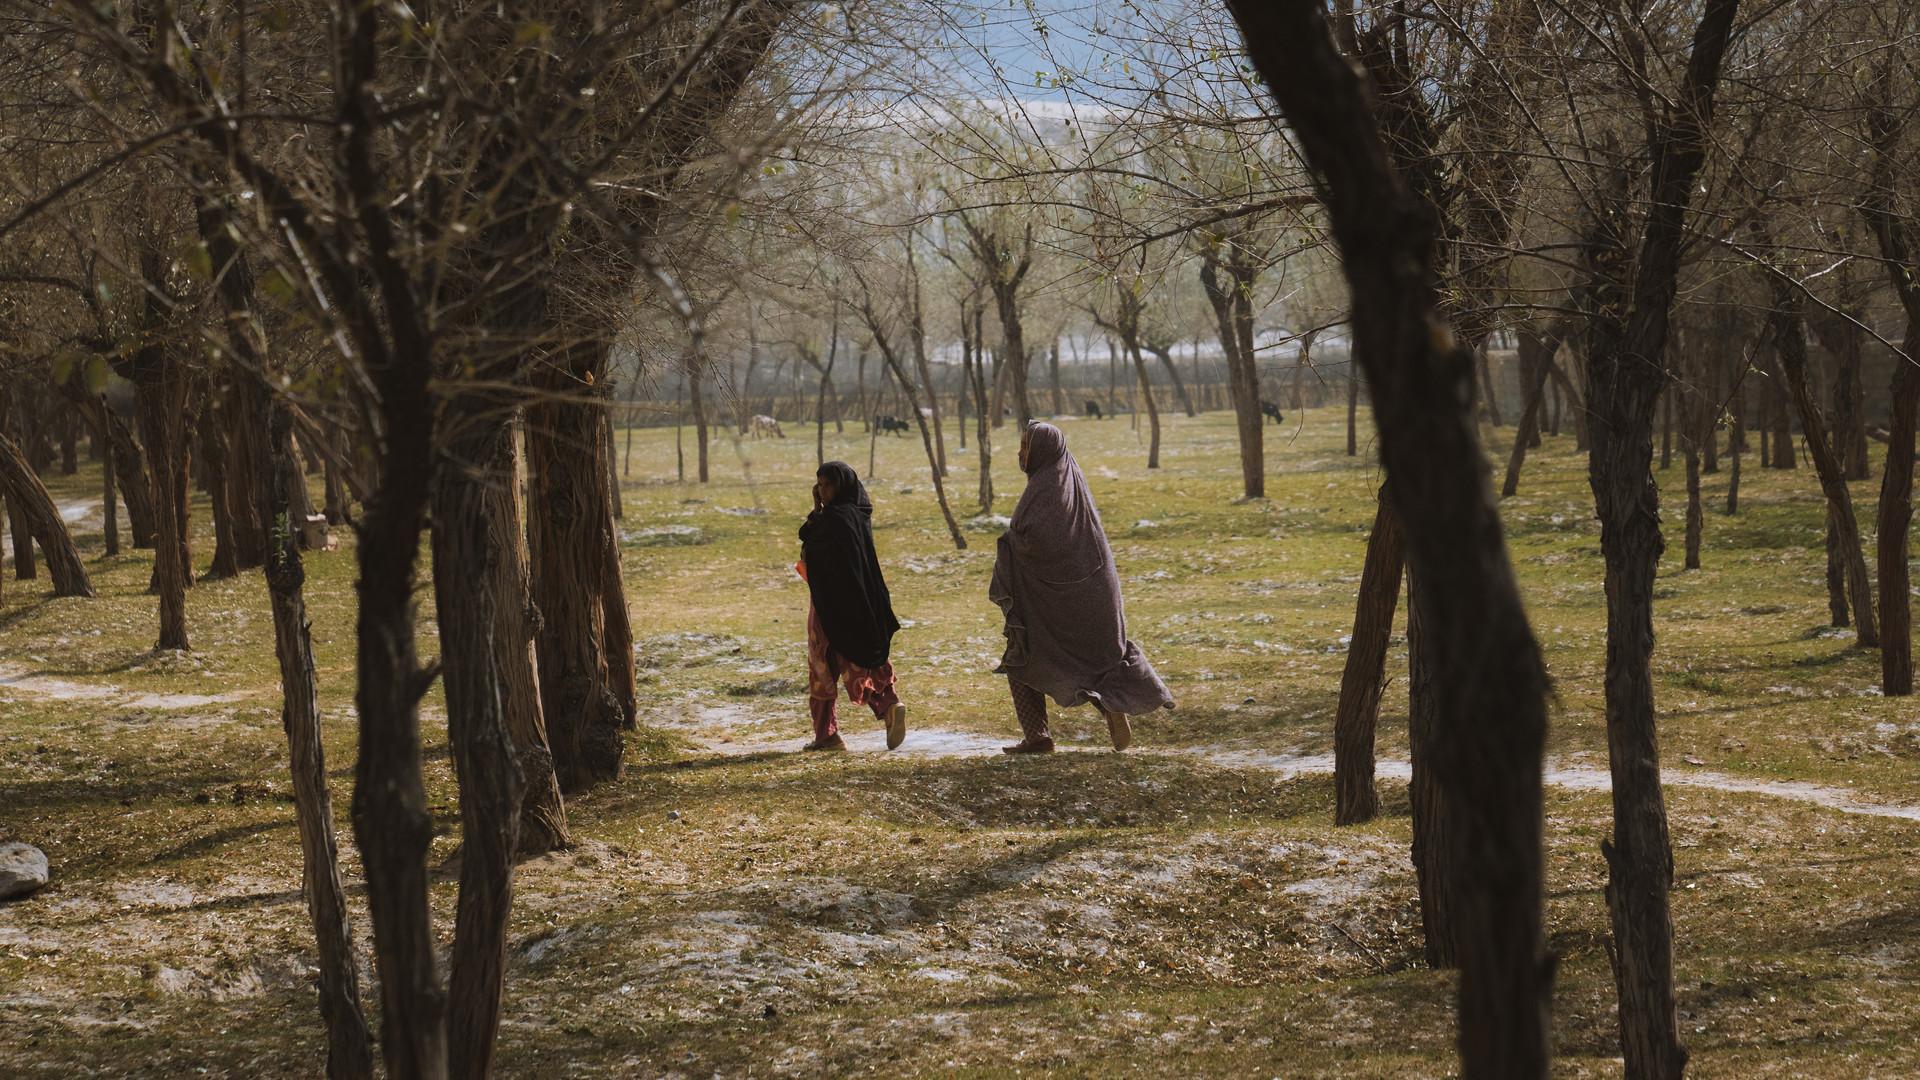 Pakistan-09324.jpg